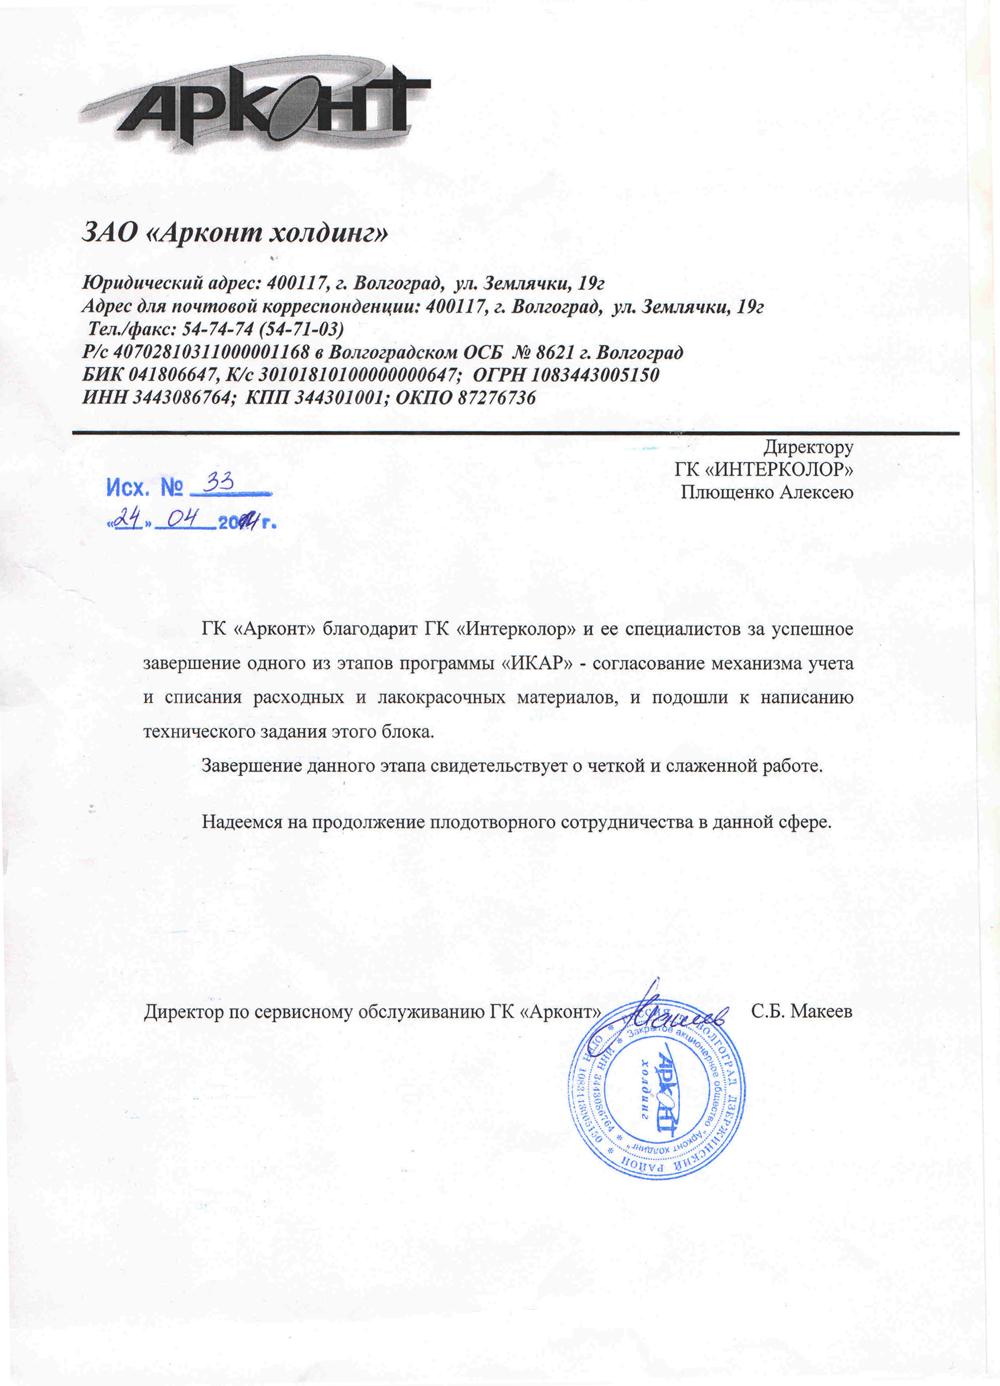 ЗАО Арконт холдинг, г.Волгоград